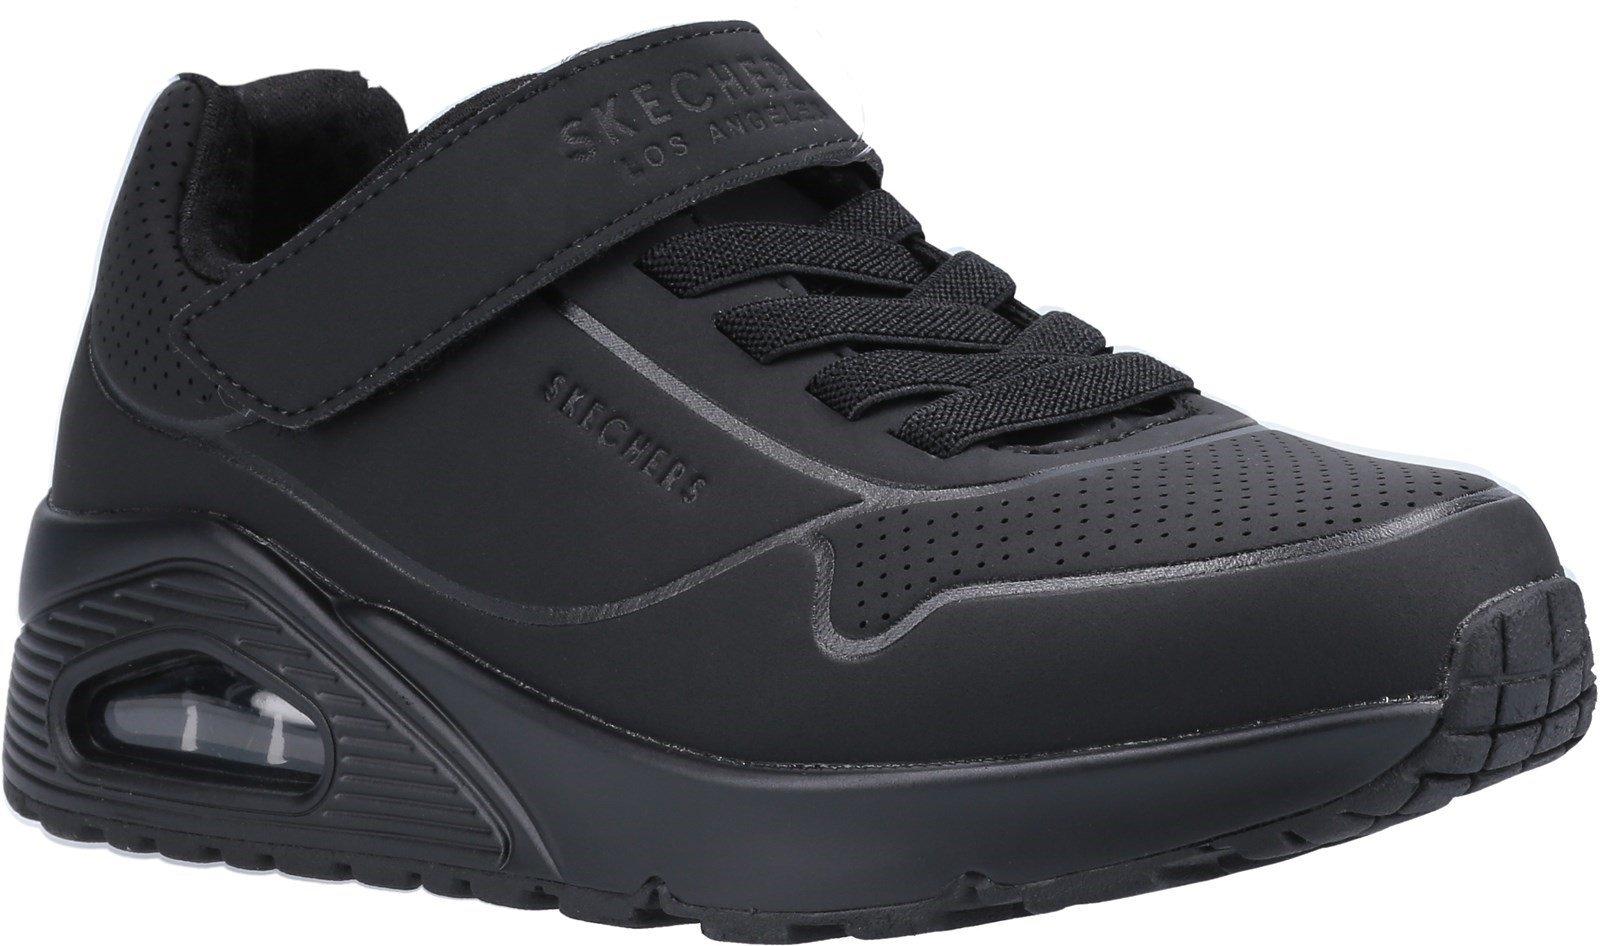 Skechers Kid's Uno Air Blitz Casual Trainer Various Colours 30898 - Black/Black 10.5